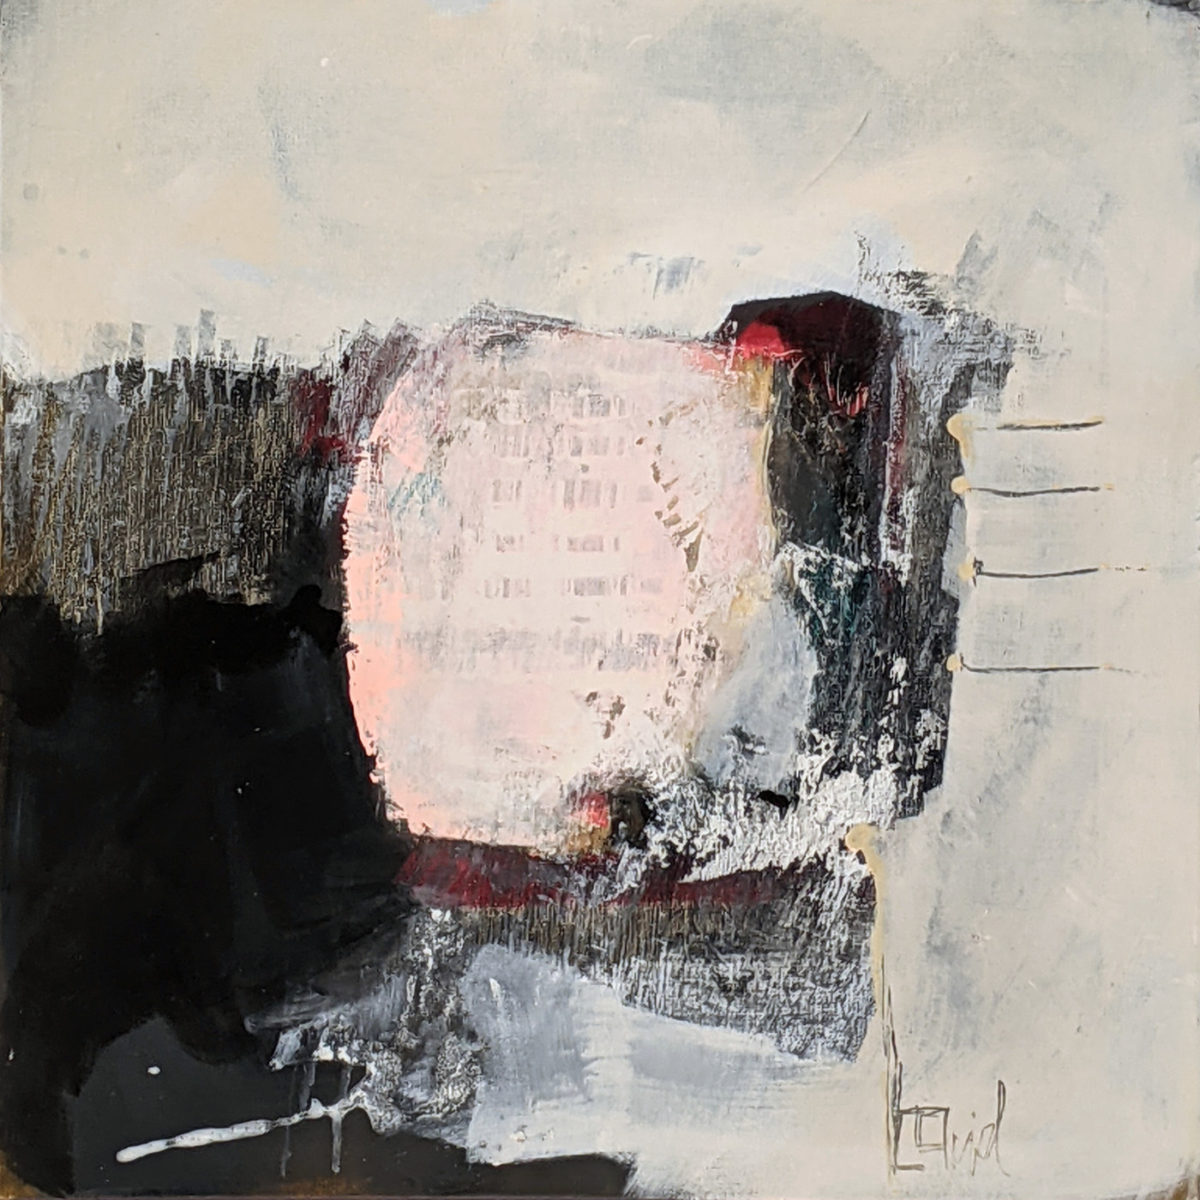 CecilePujol DansSesPensees11 1200x1200, Galerie1809